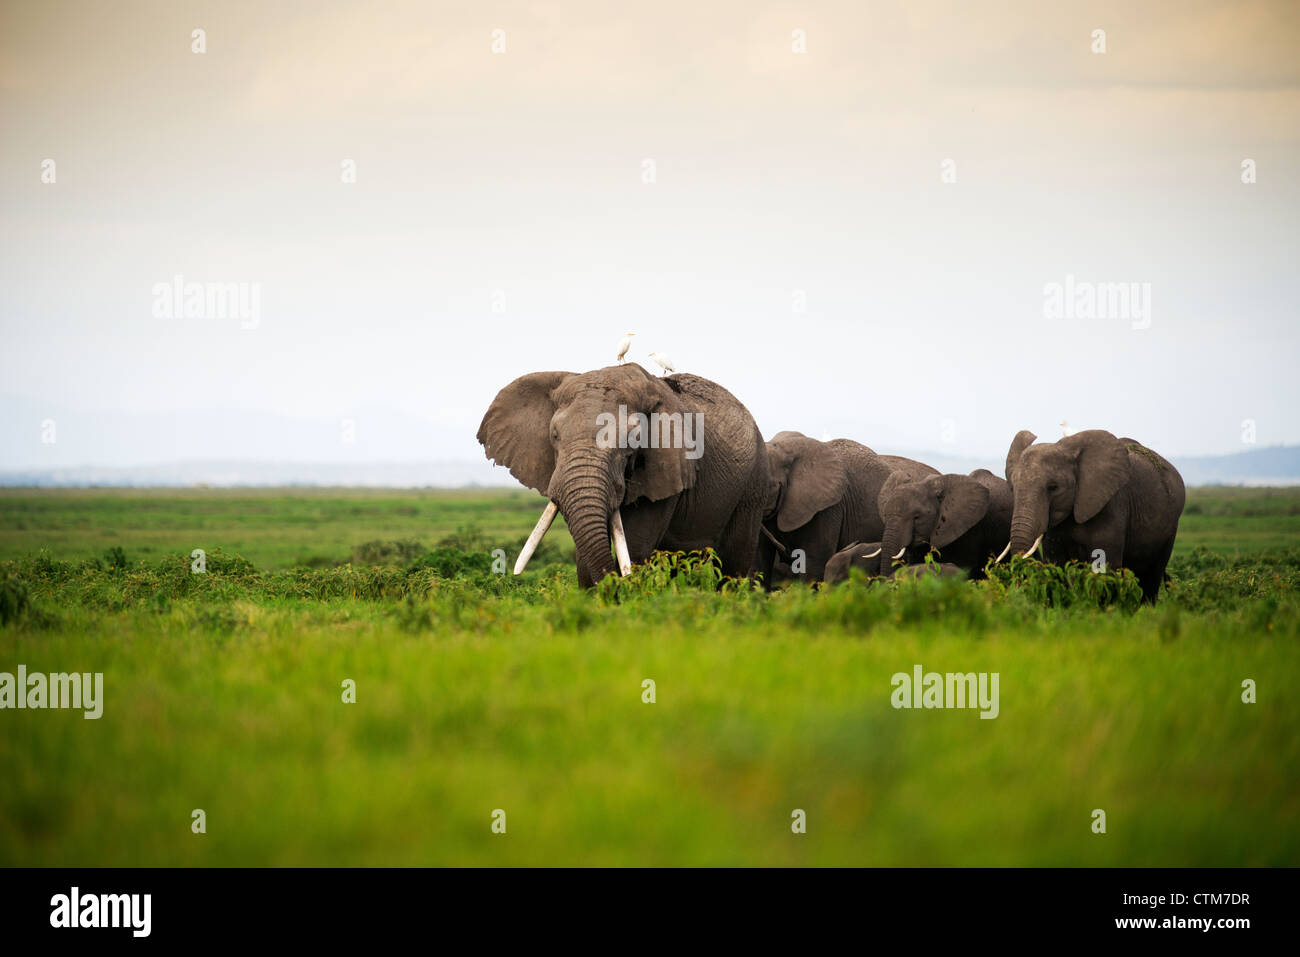 African Elephant herd at sunset in Amboseli National Park, Kenya - Stock Image